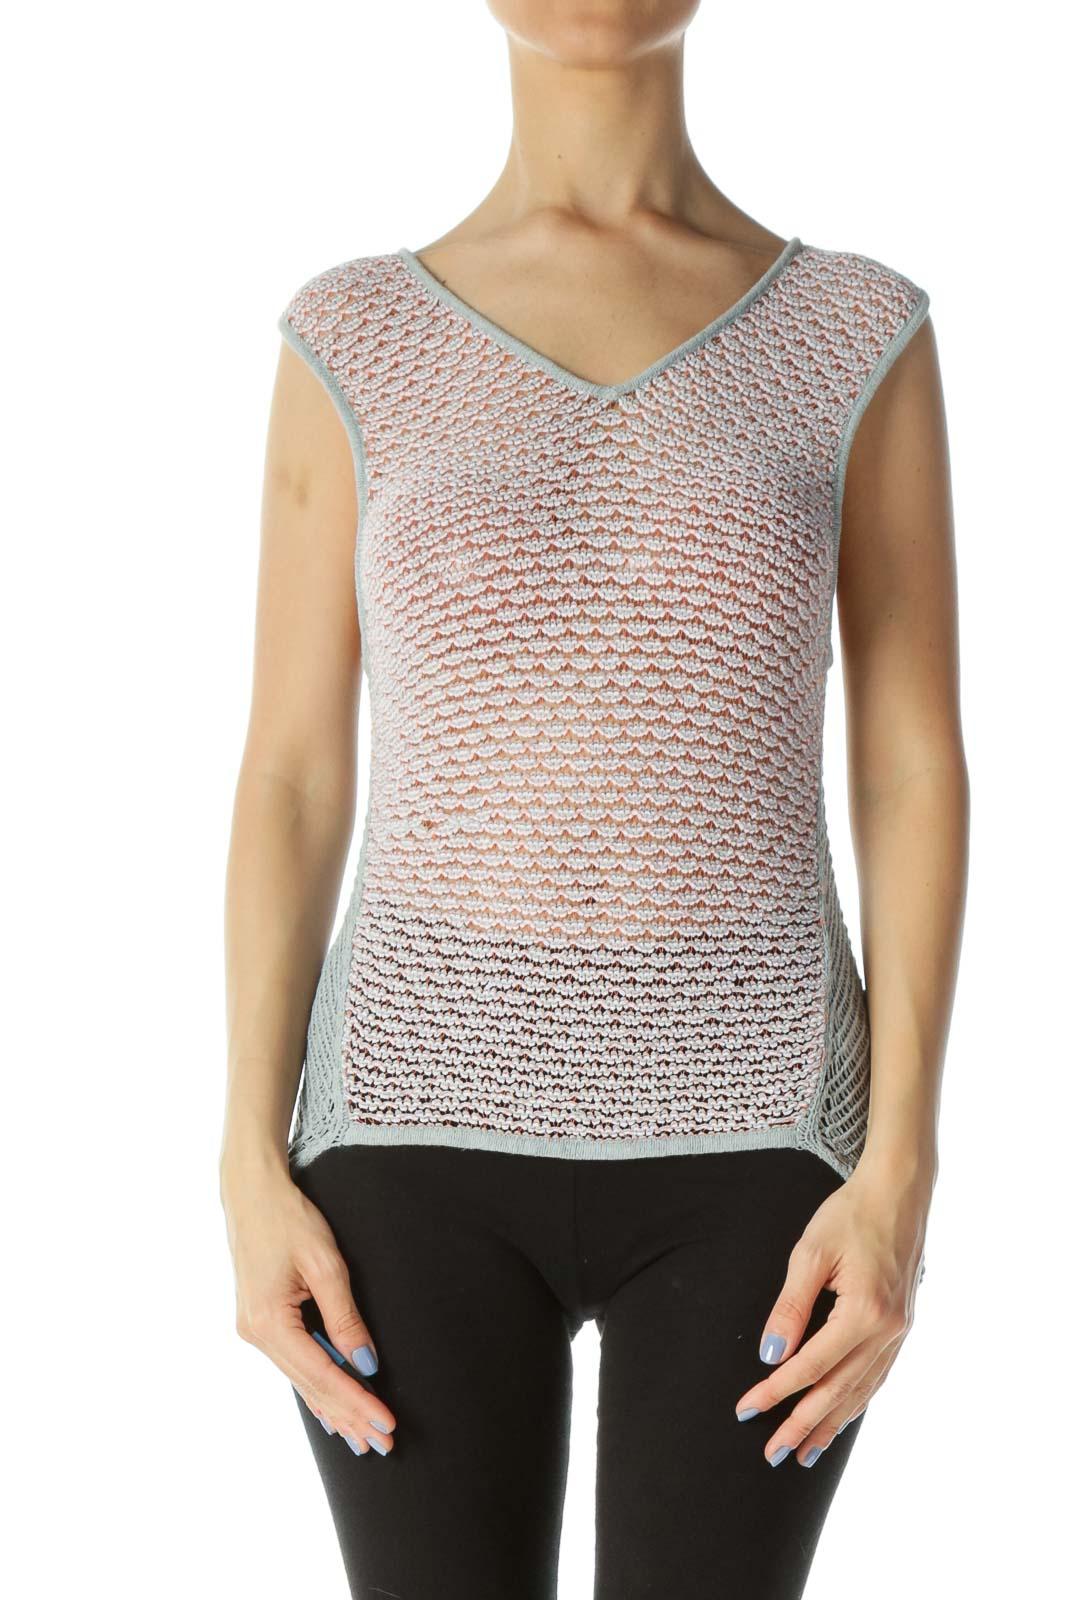 Orange Teal & Cream Patterned Designer Crocheted Sleeveless Knit Top Front